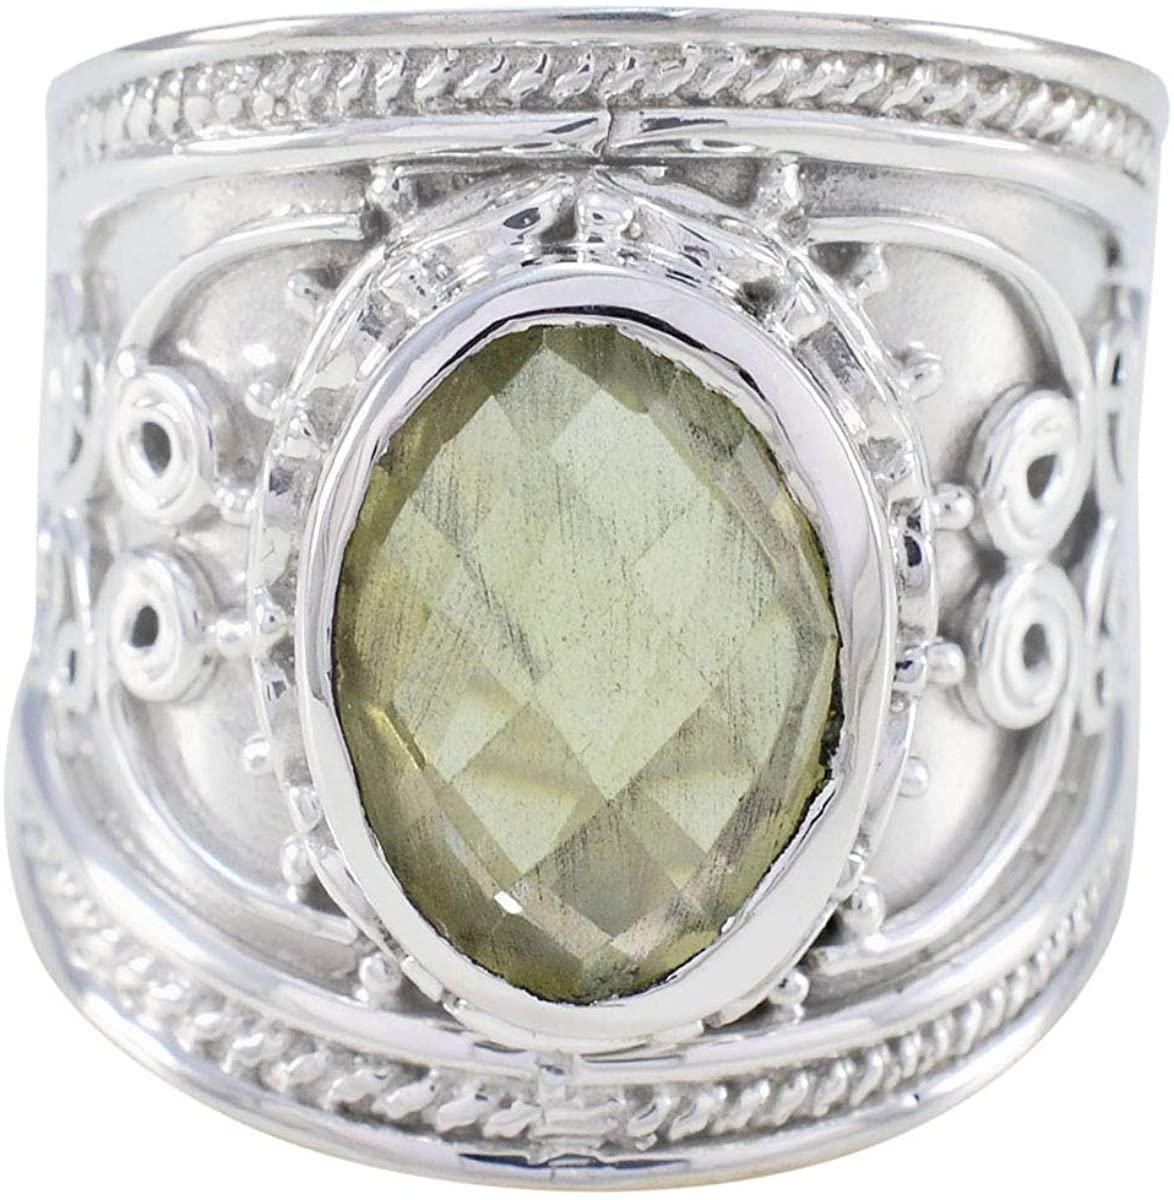 Joyas Plata Good Gemstones Oval Shape One Stone cheker Lemon Quartz rings-925 Silver Yellow Lemon Quartz Ring-April Birth Aries Astrology Good Gemstones Ring SRLQUCH-3175-4 us